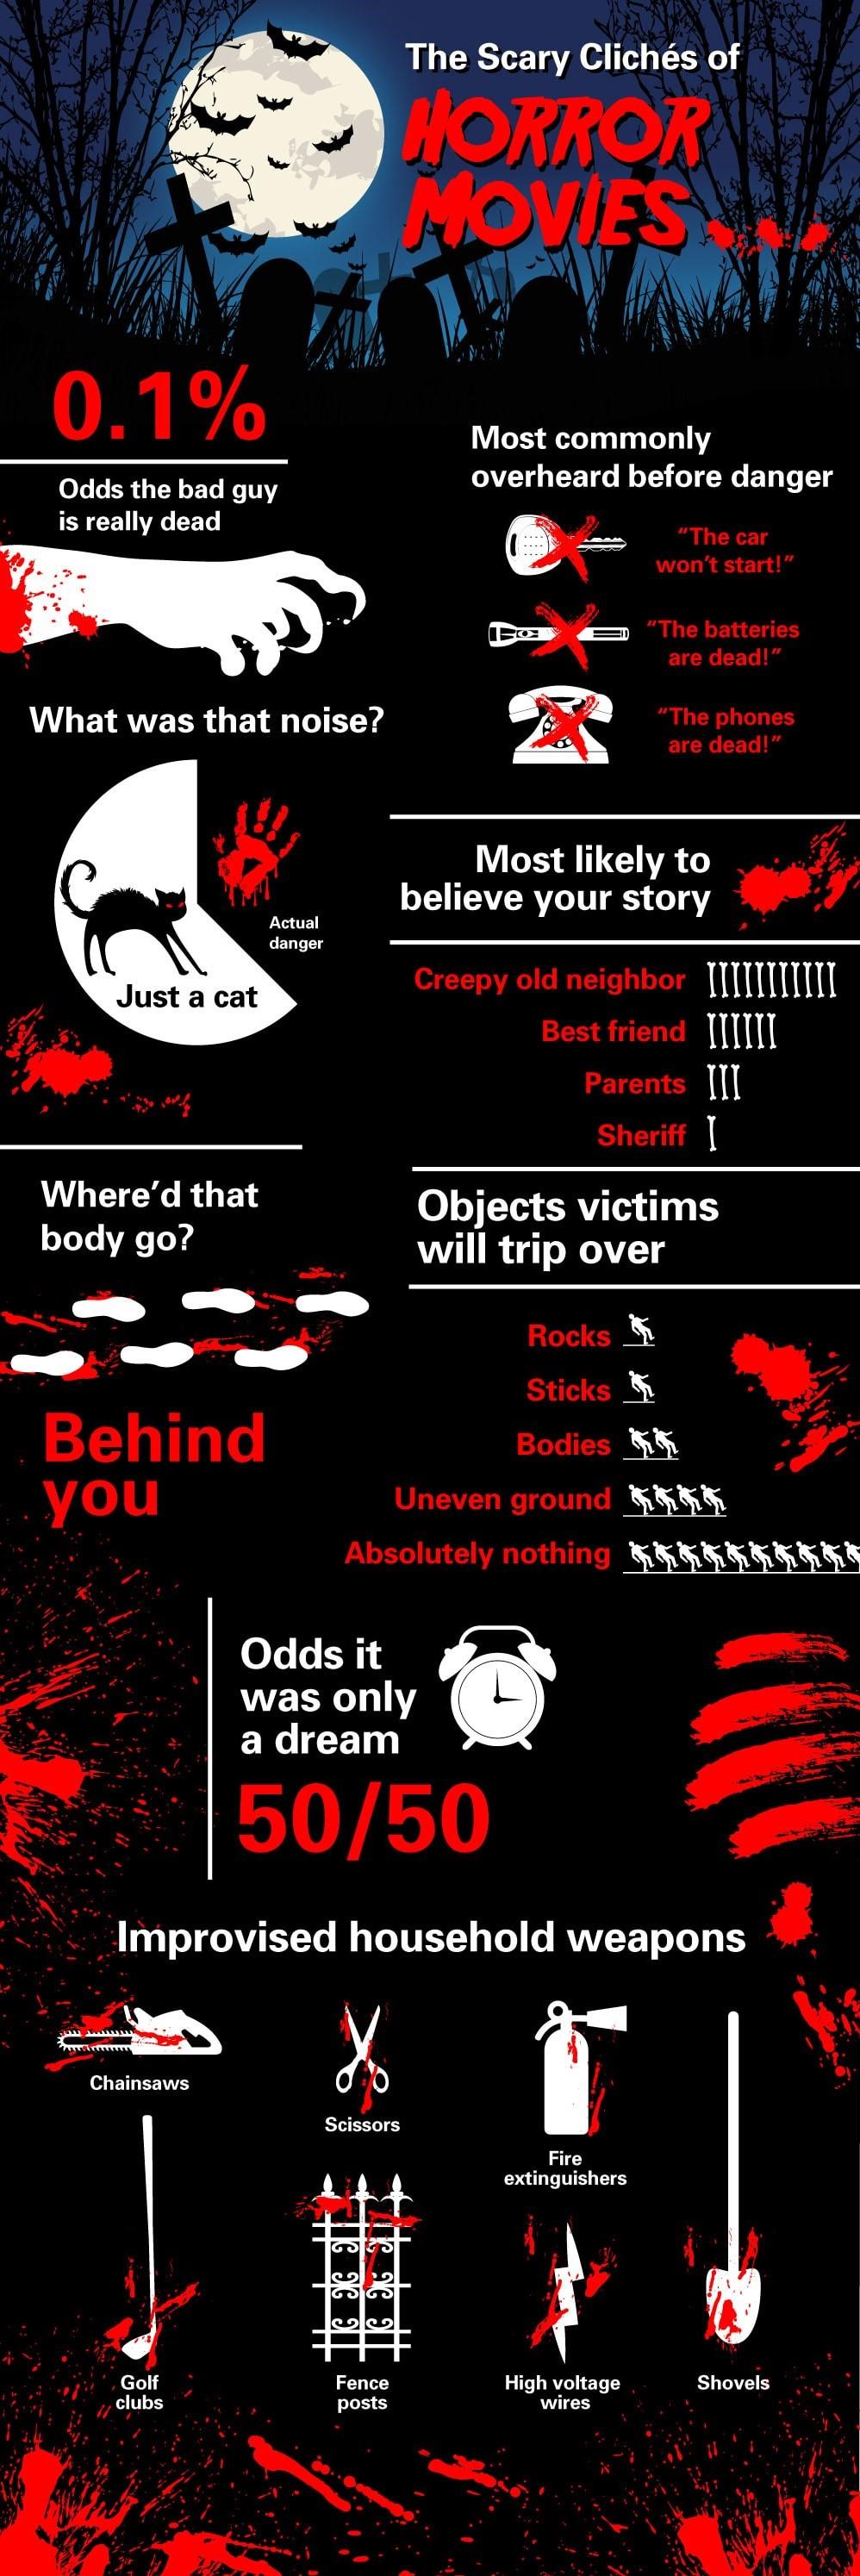 Jason_Voorhees_the_Badass_of_Horror_5